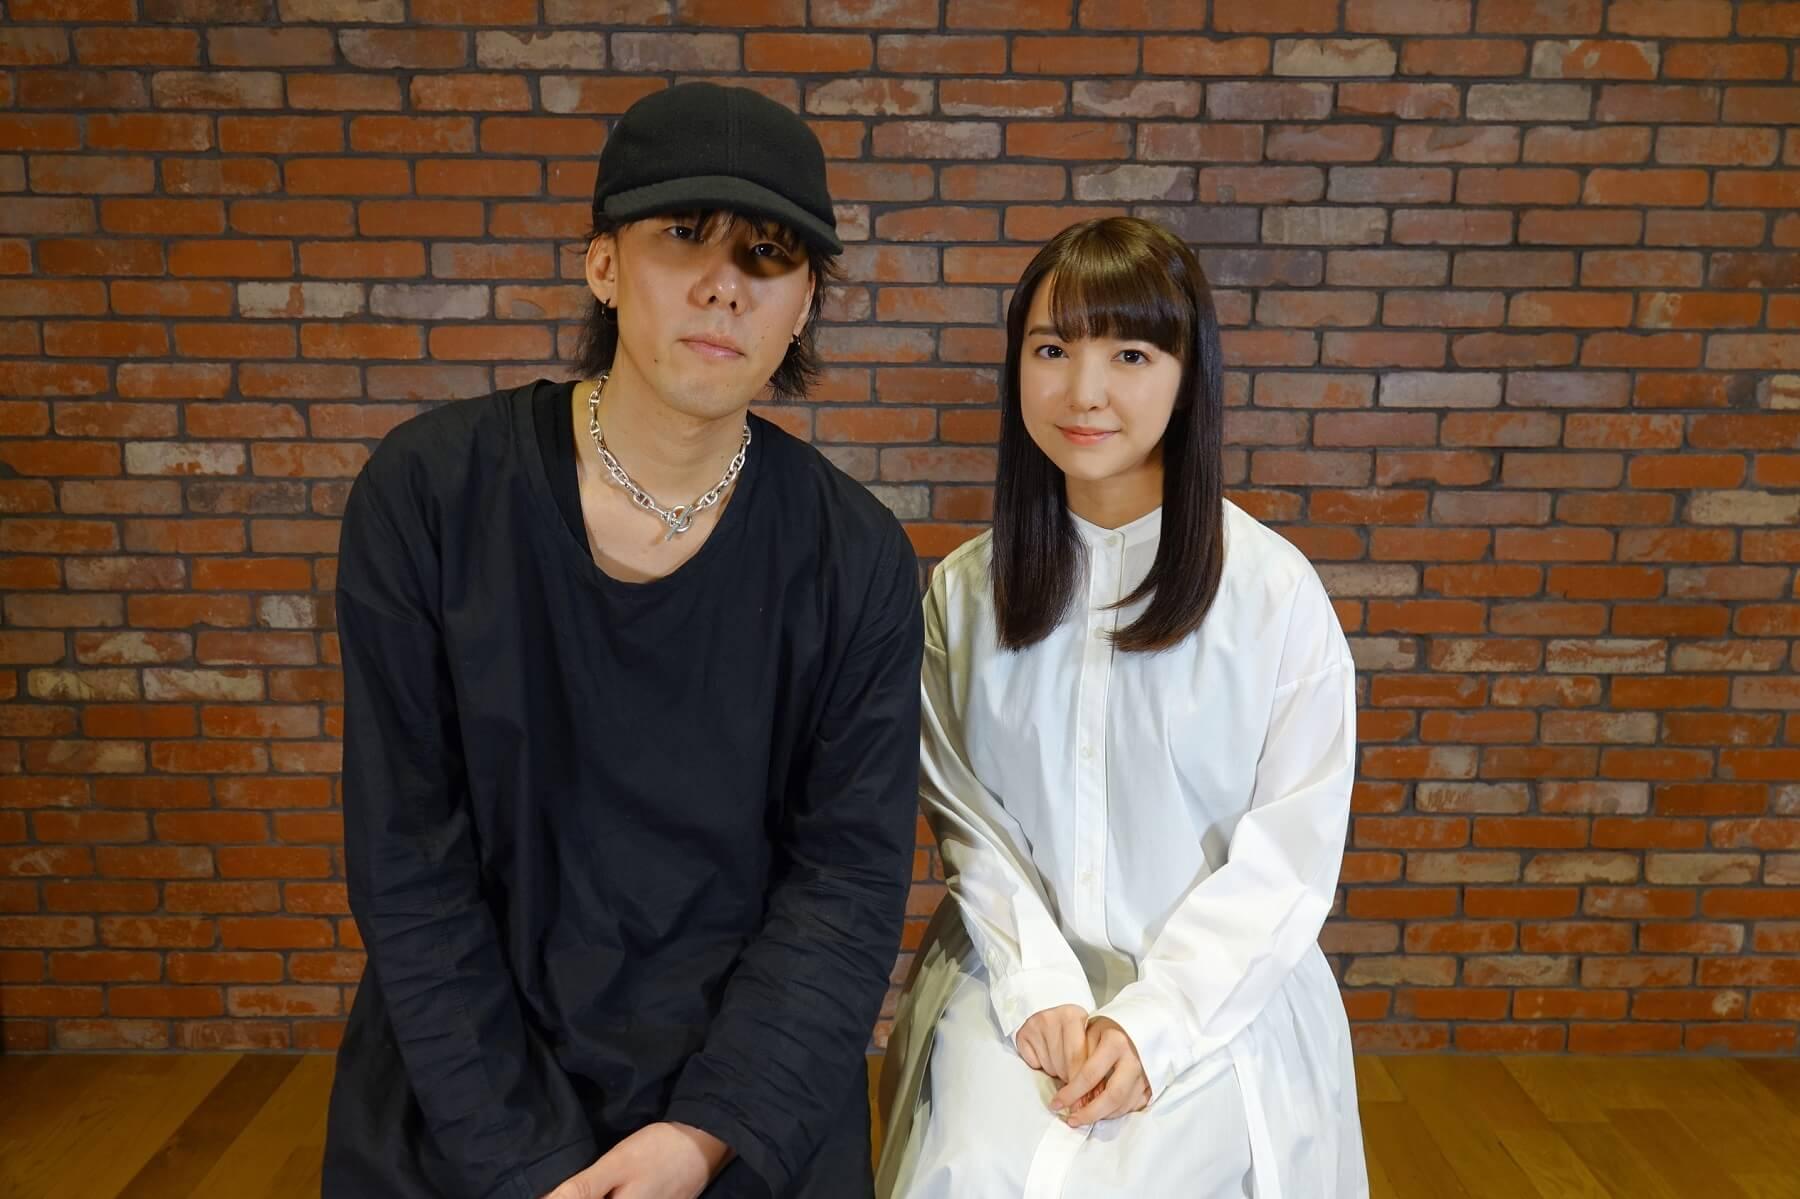 RADWIMPS 野田洋次郎 上白石萌音 映画『楽園』主題歌レコーディング時2ショット